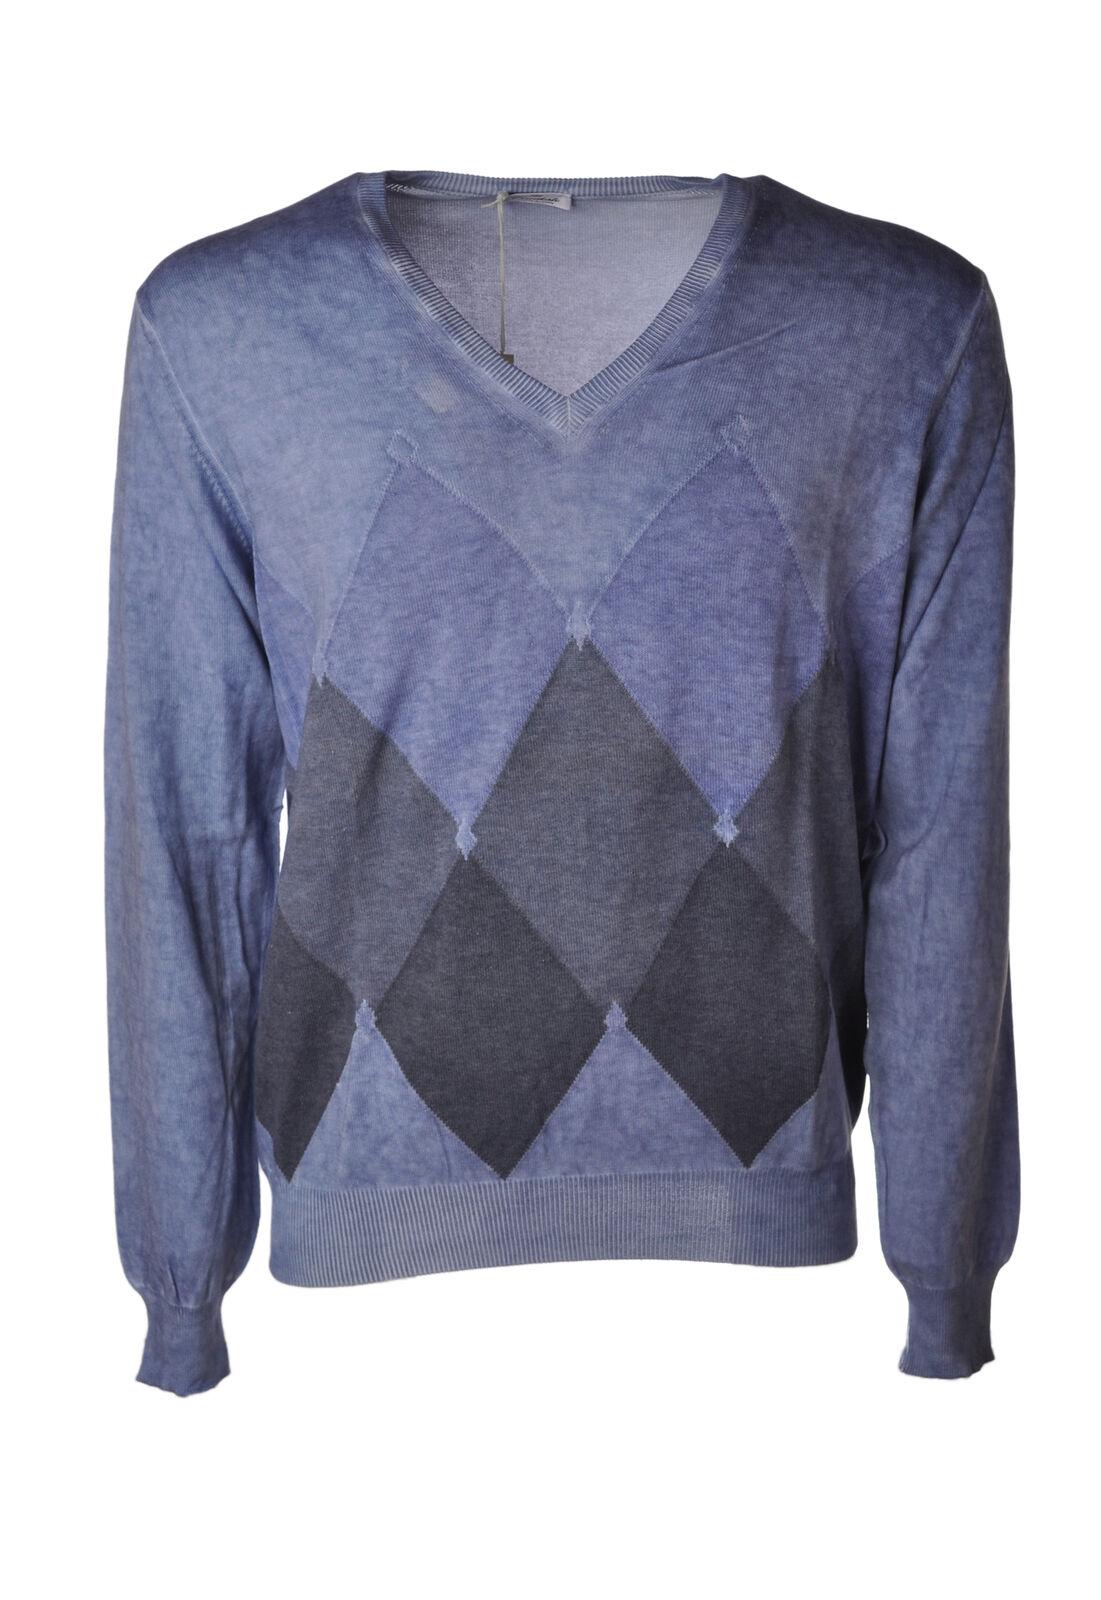 Viadeste  -  Sweaters - Male - Blau - 4664421A180149